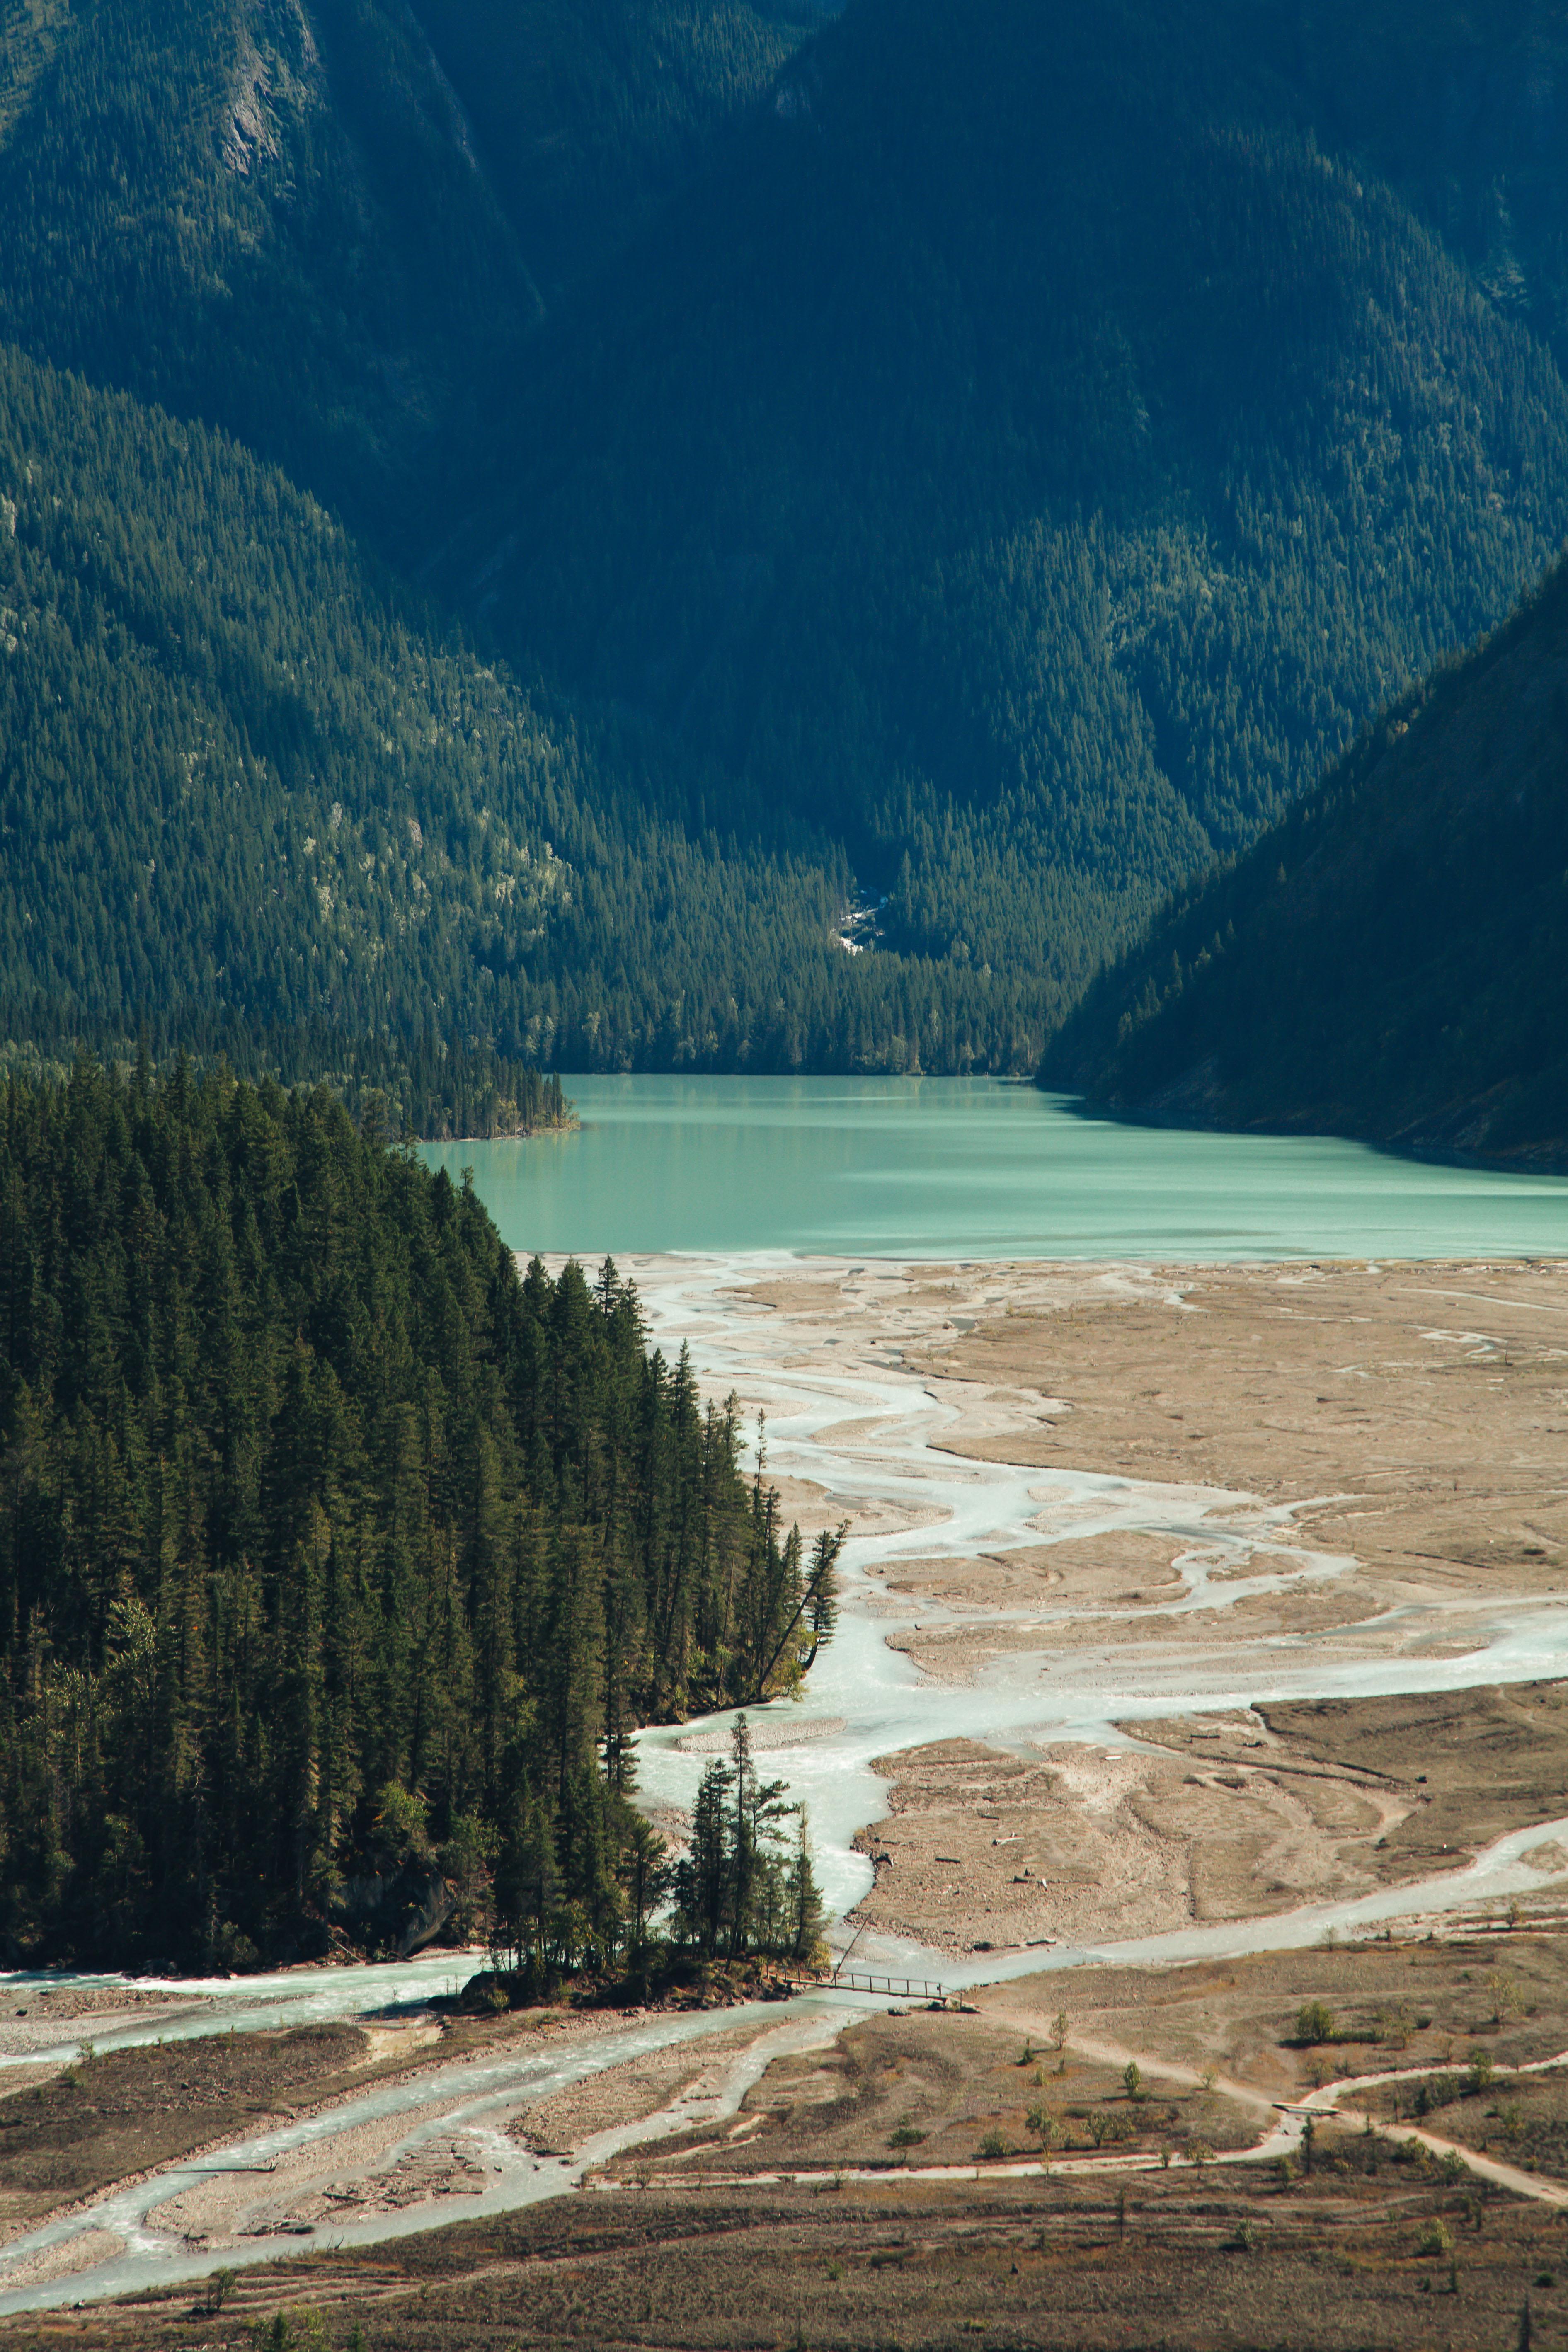 Upper Joffre Lake, British Columbia, Canada